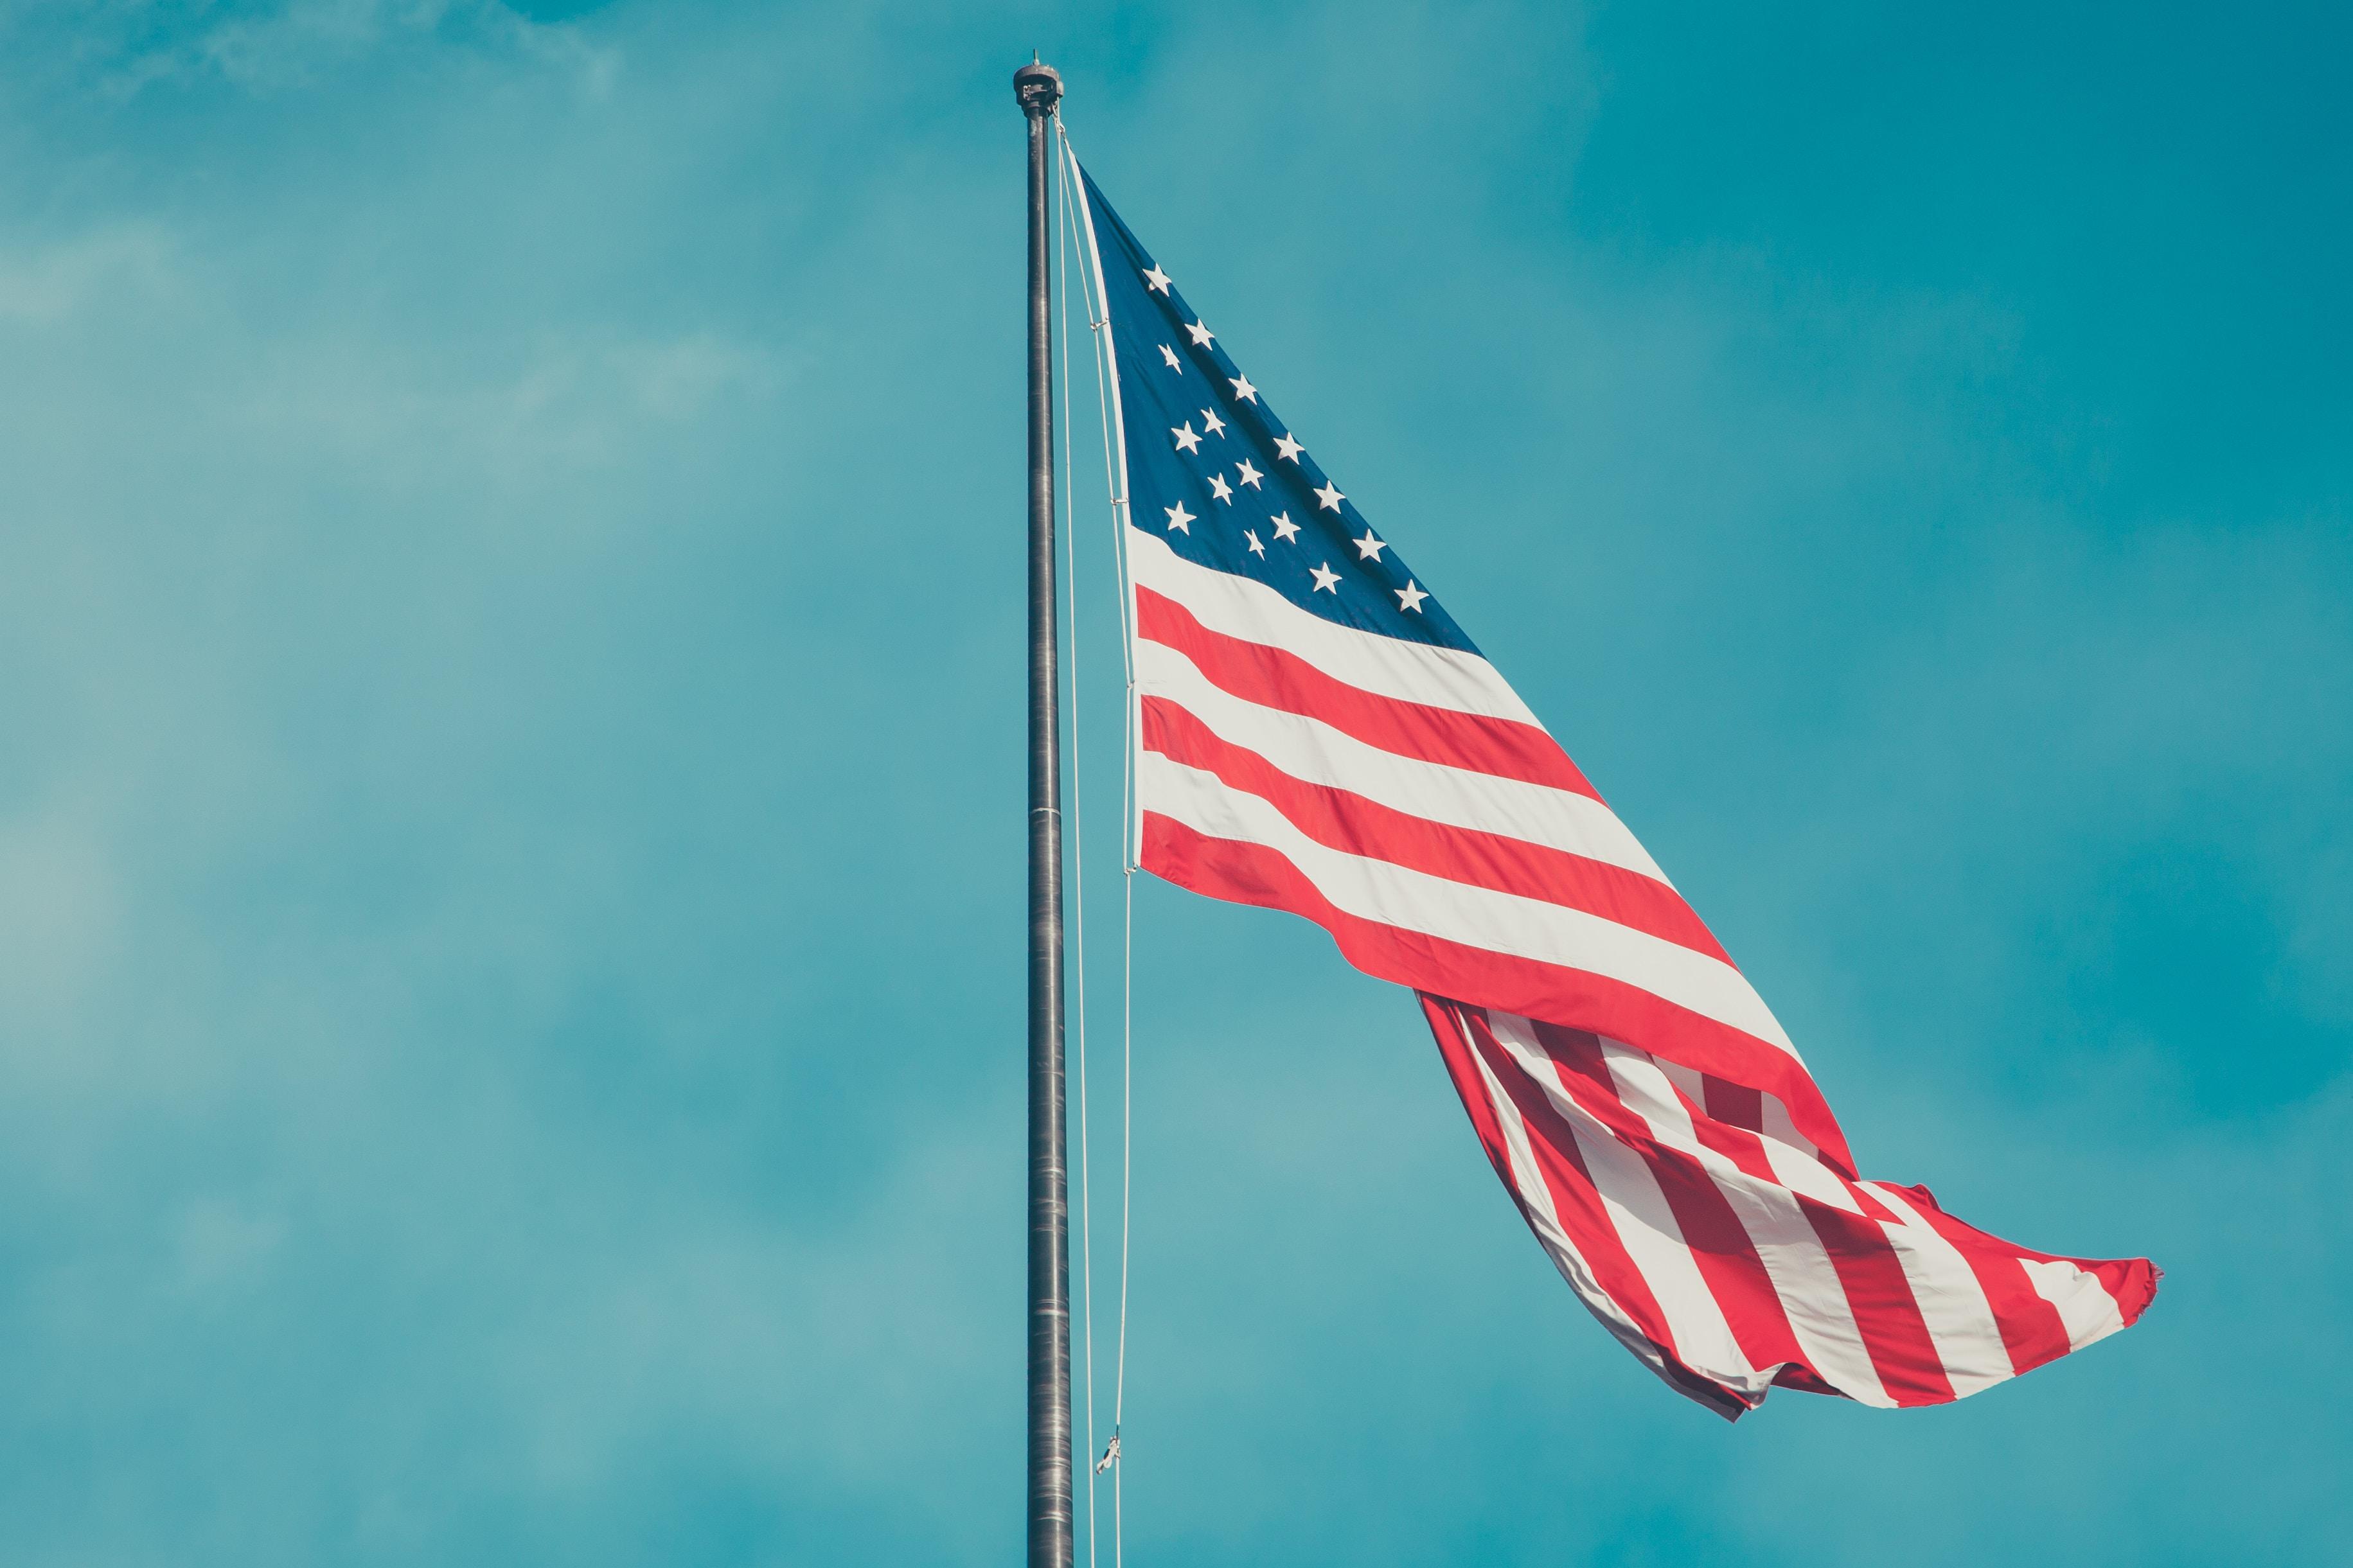 raised USA flag under blue sky